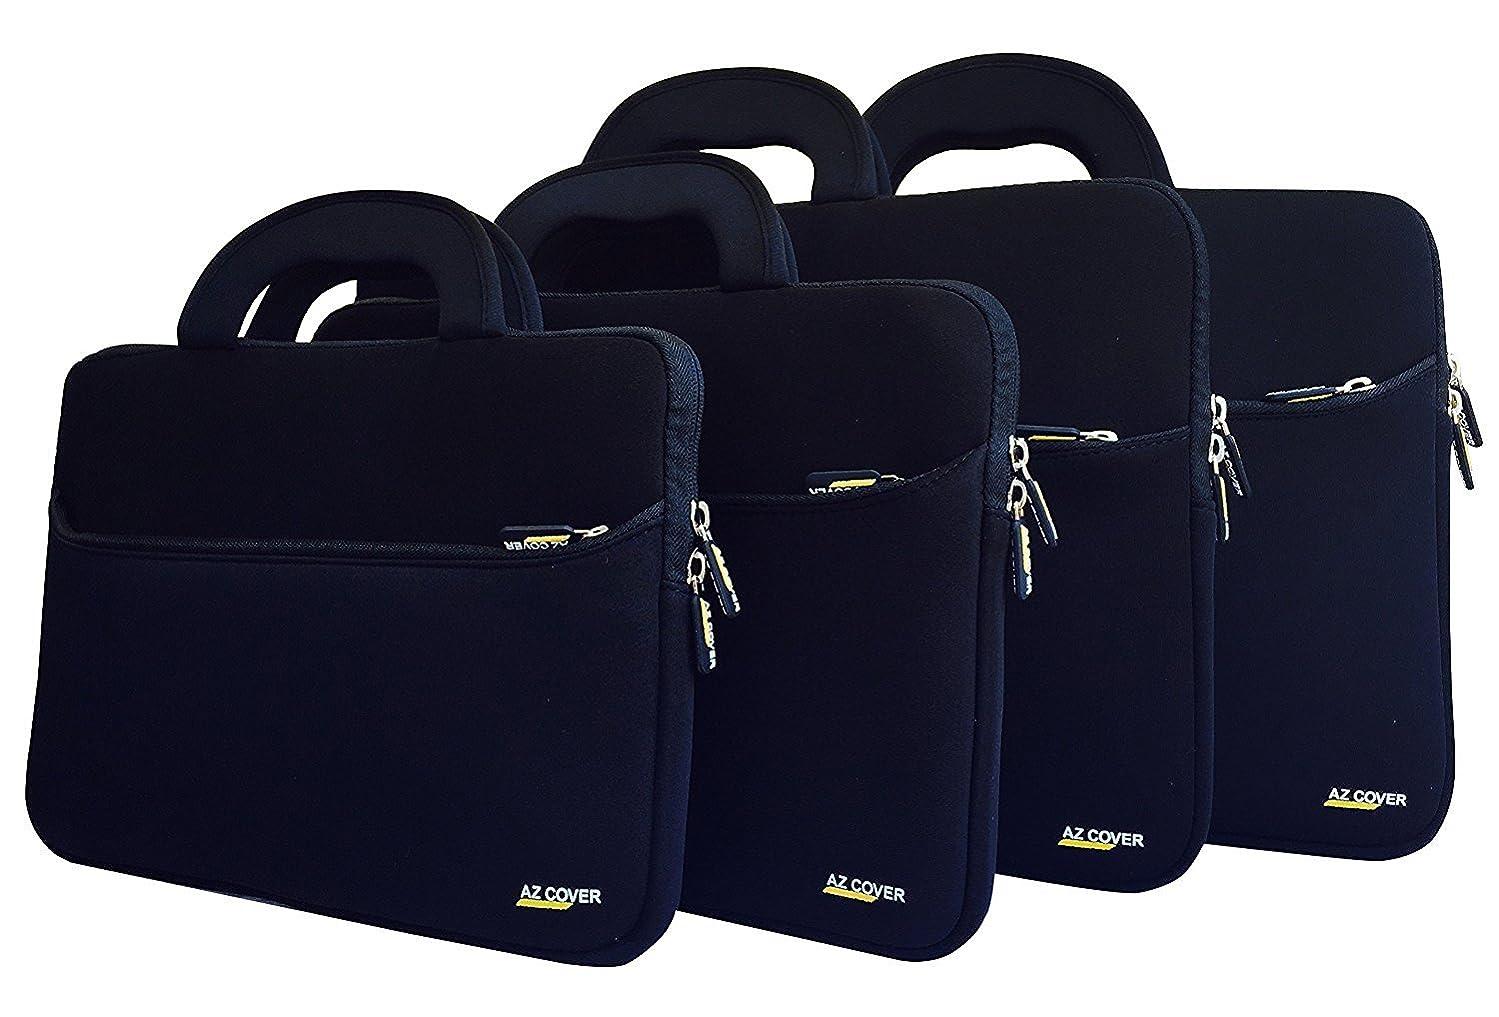 AZ-Cover 15.6-Inch Laptop Sleeve Case Bag (Black) With Handle For HP Pavilion 15.6-Inch Laptop 6th Gen Skylake, Intel Core i5-6200U